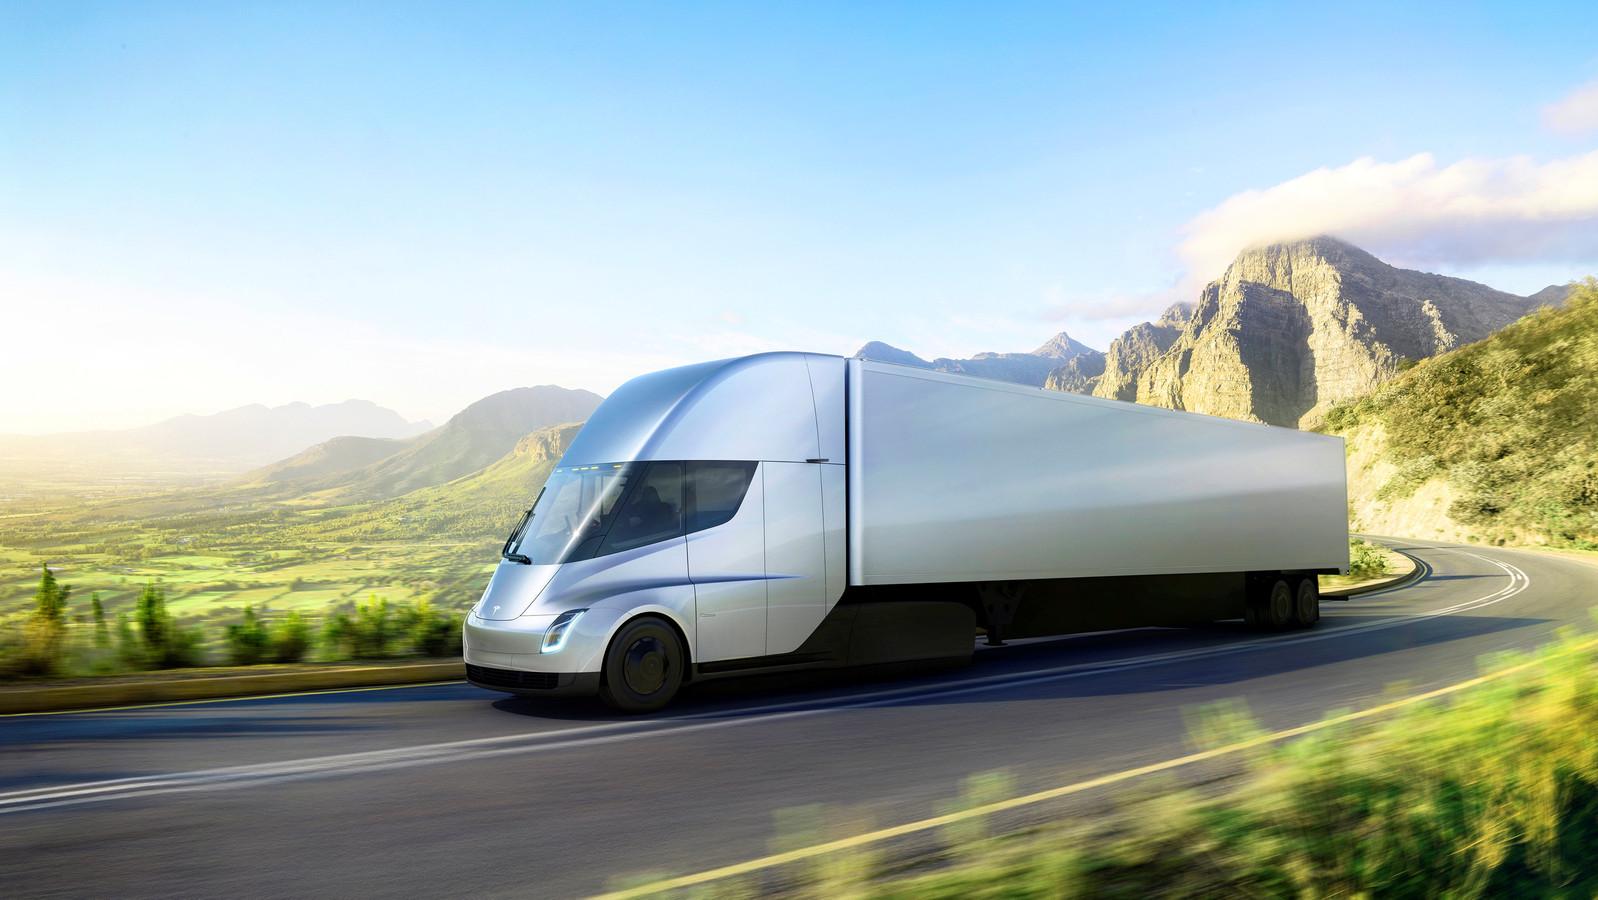 Tesla's elektrische Semi truck